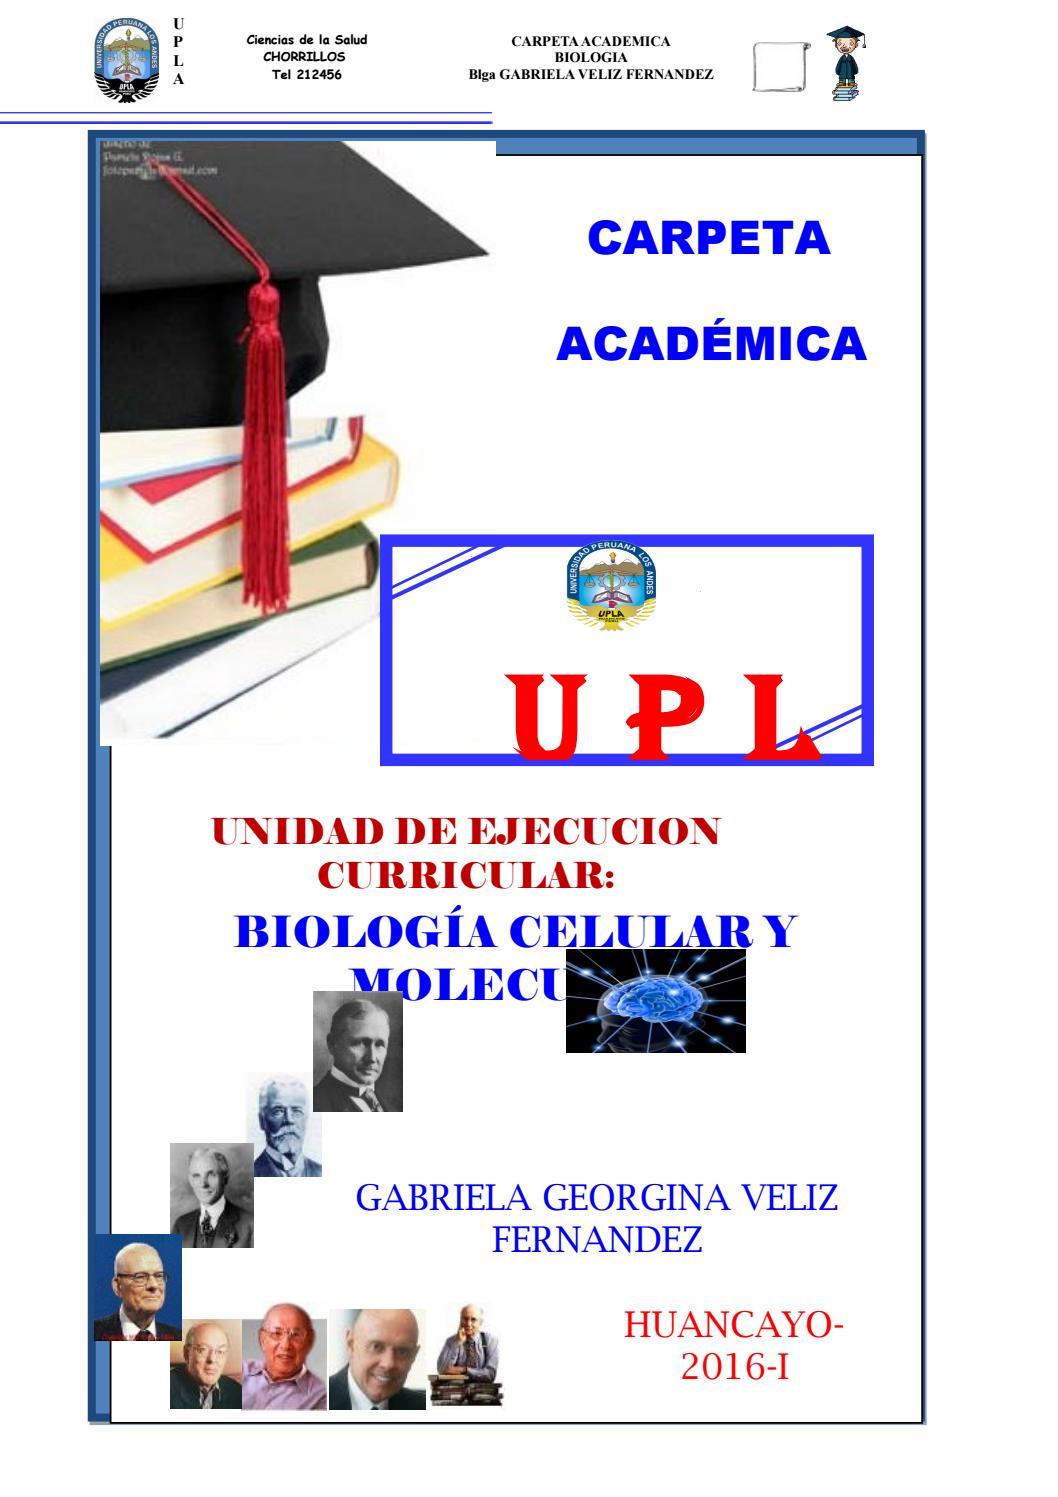 Carpeta academica psicologia by GABRIELA GEORGINA VÉLIZ FERNÁNDEZ ...